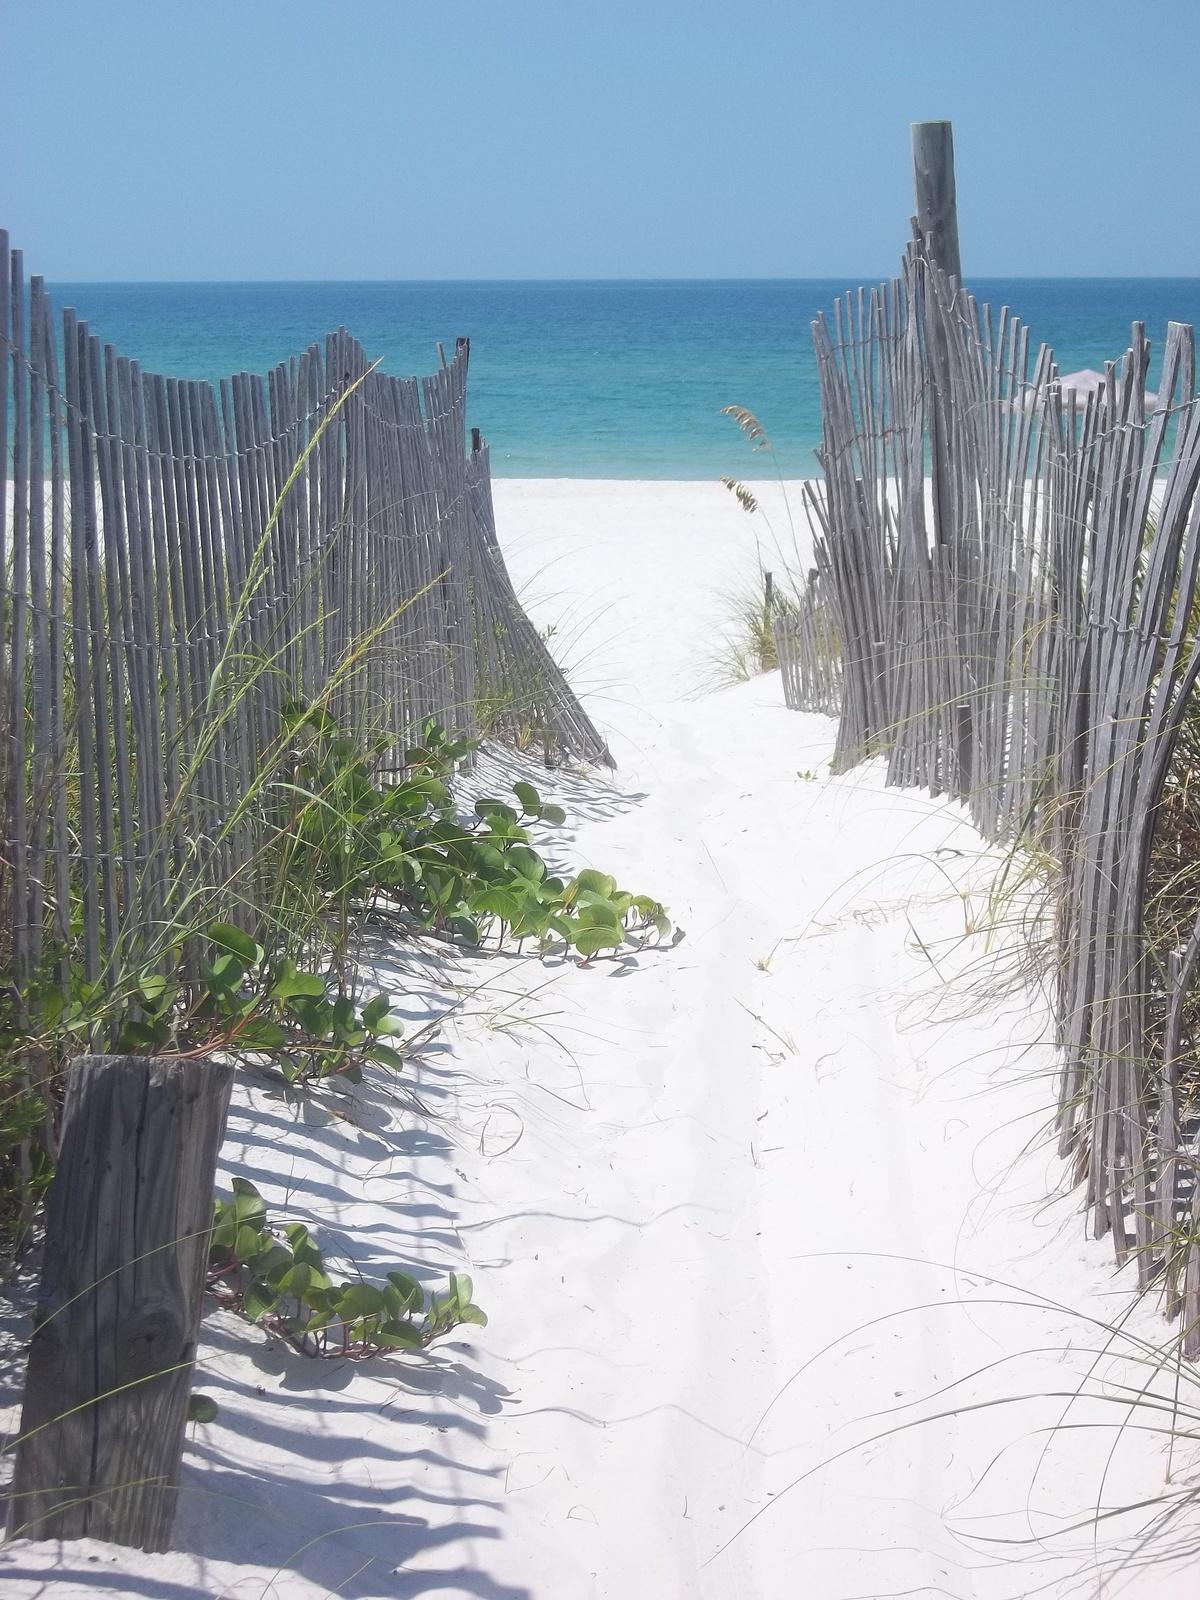 9ac55cd65f7ce0de485ddaeddefab6d9 - best summer family vacation spots best places to visit